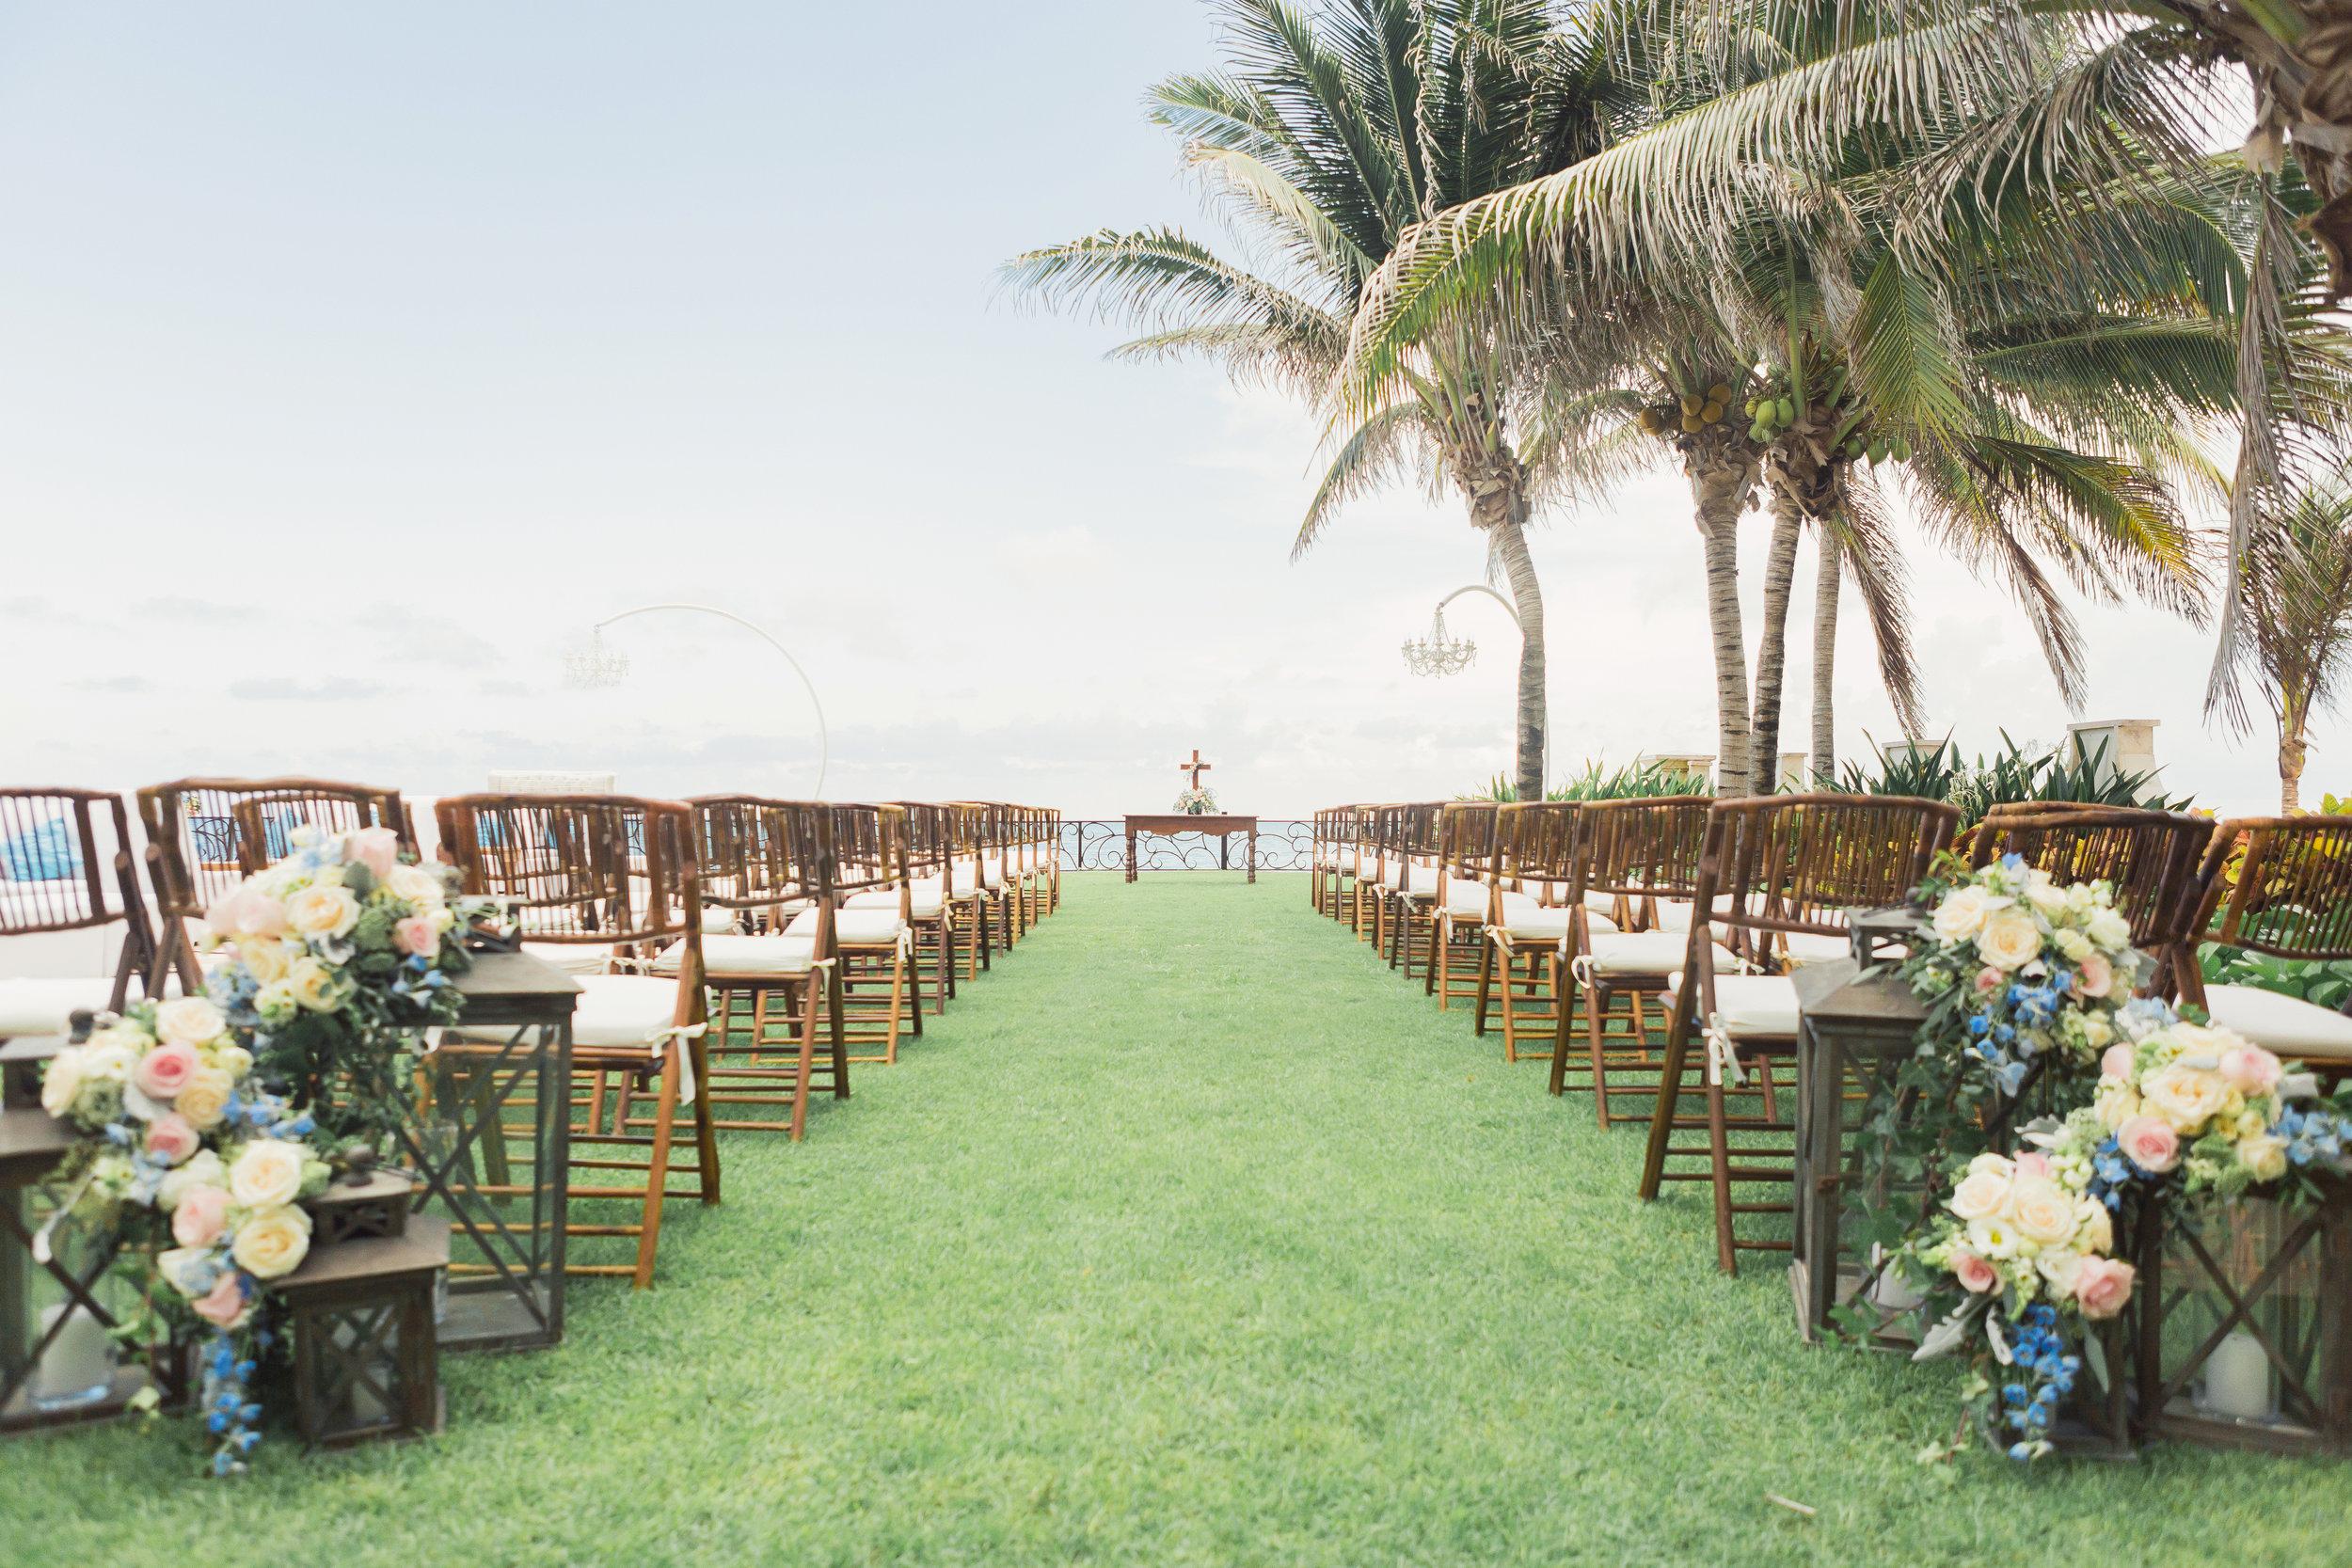 cancun-wedding-venue-villa-la-joya-24.jpg